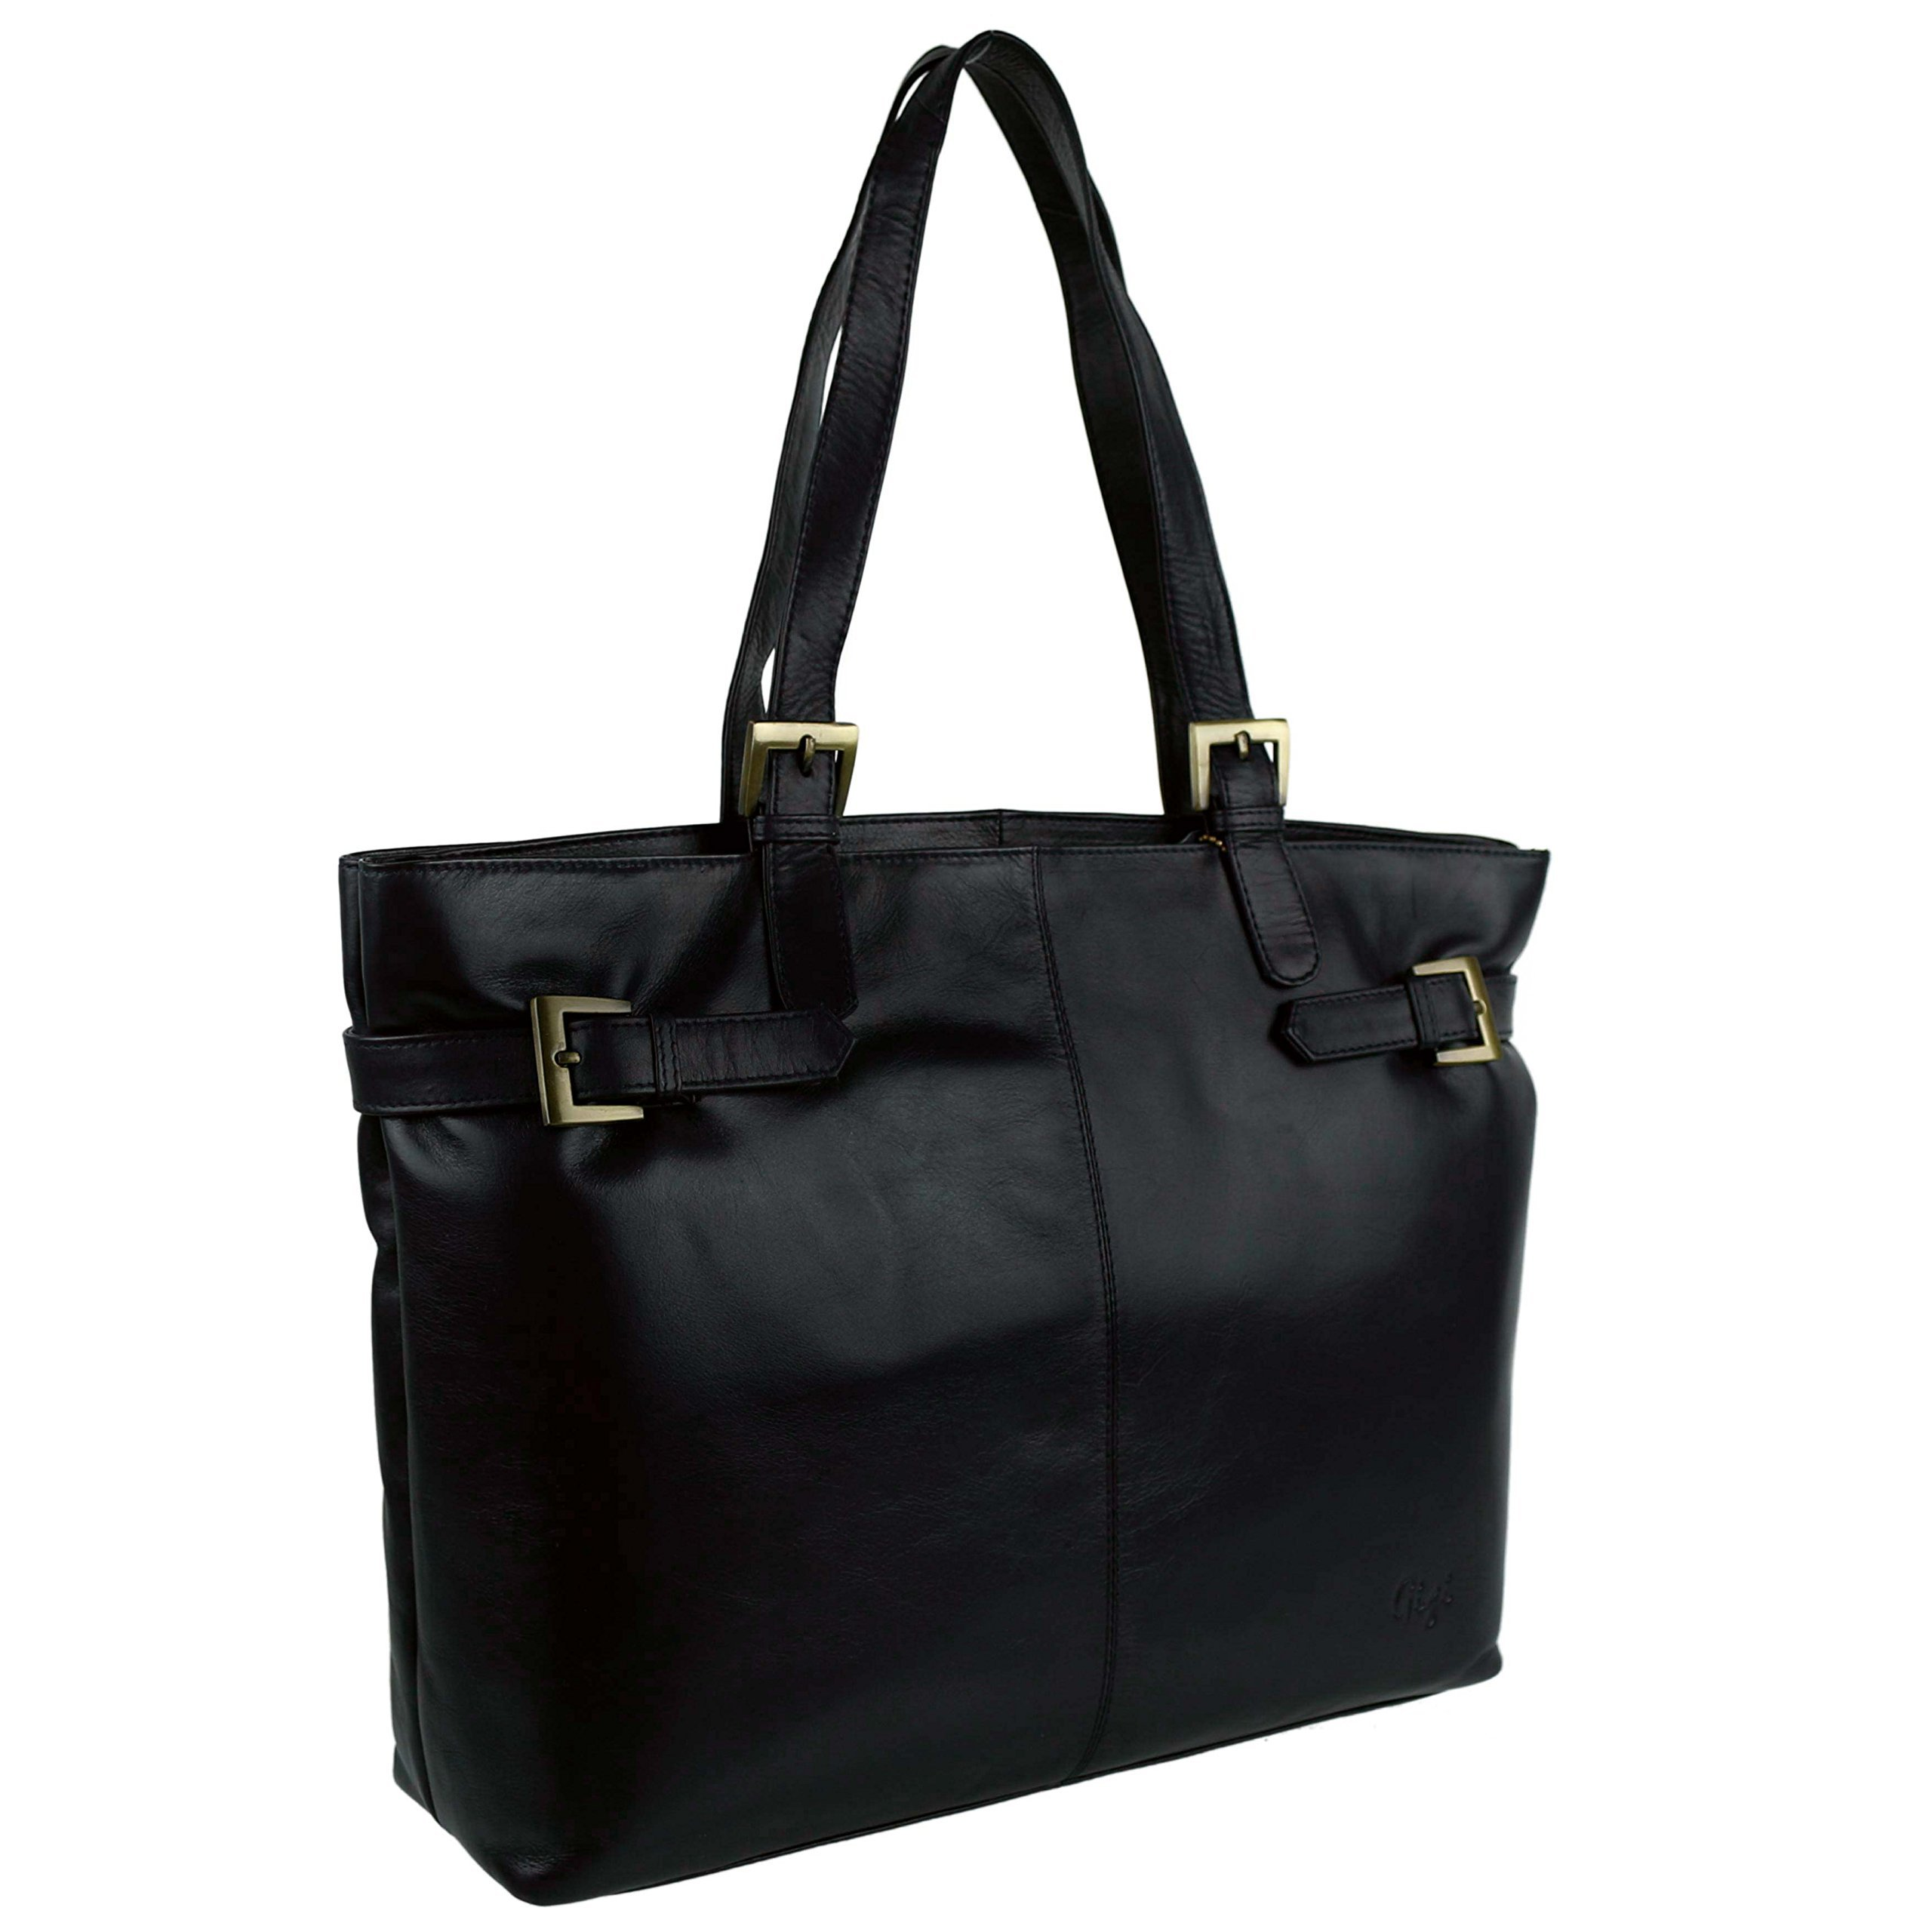 GIGI Women's Soft Leather Work Bag By Gigi Classic Navy Brown Handbag Large Black by GIGI